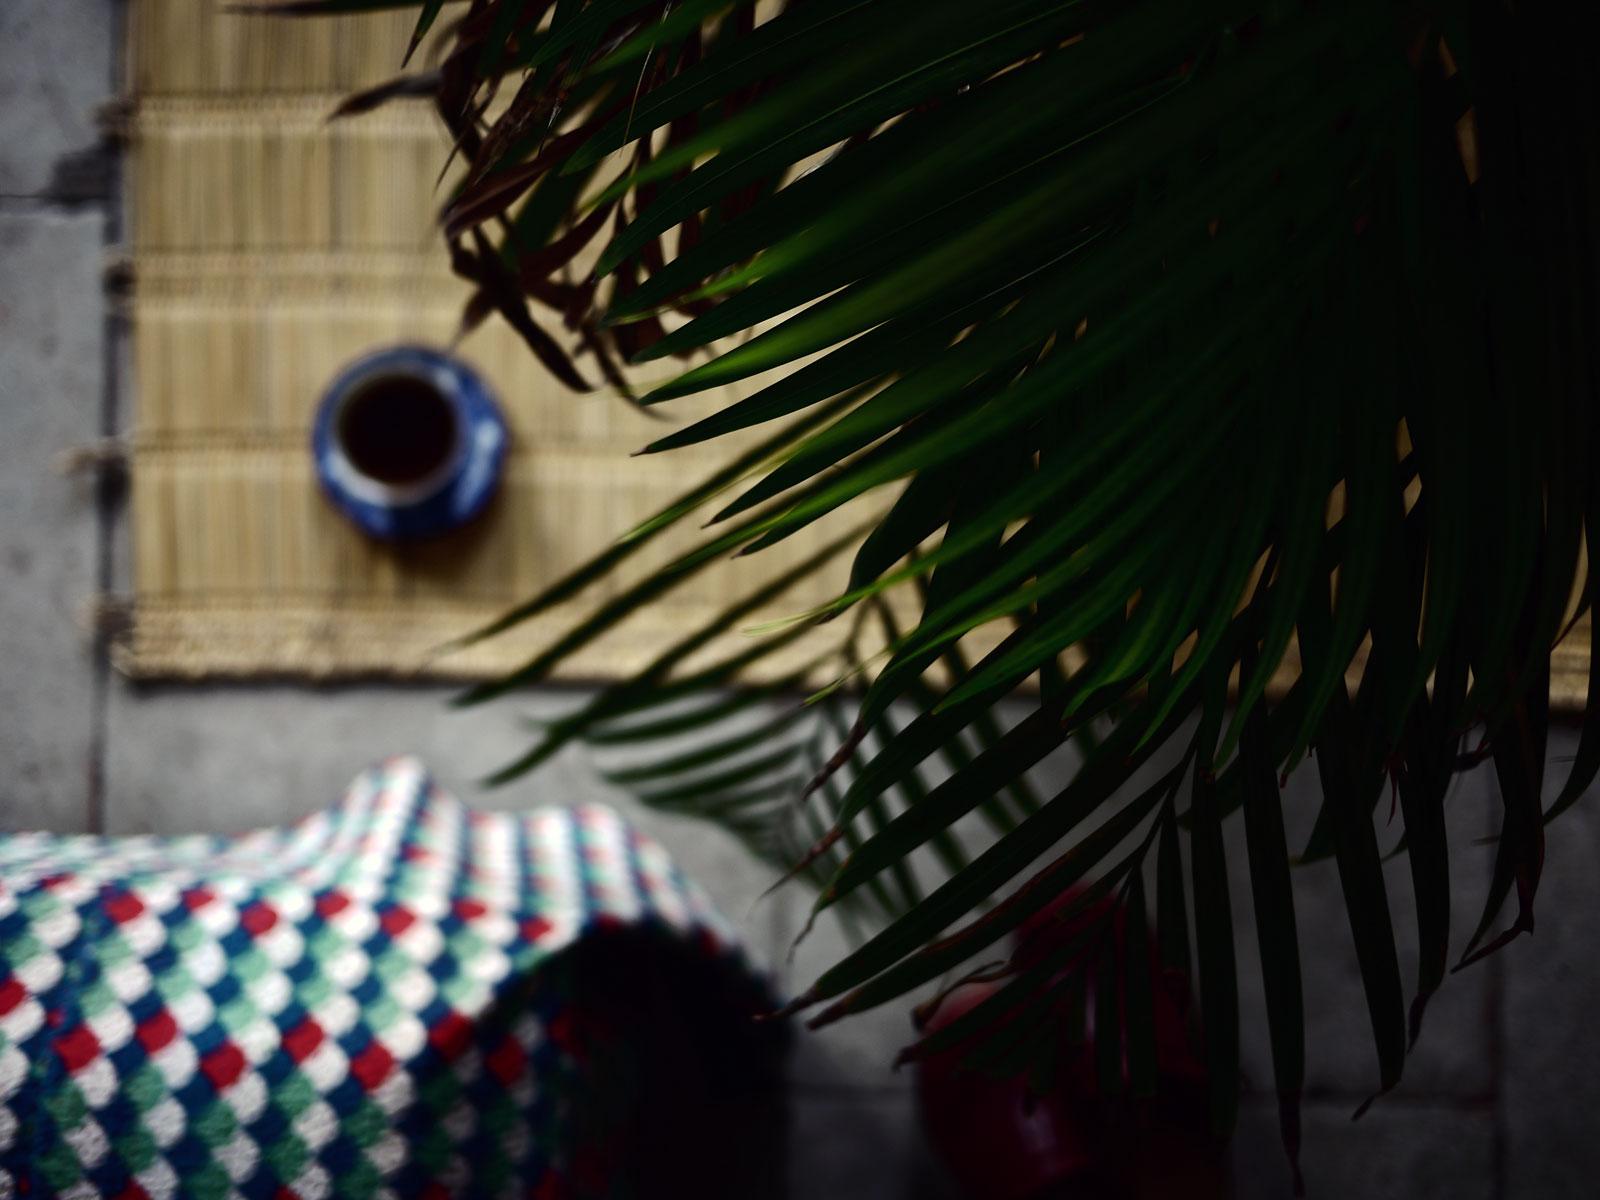 Bracelets LOOM - Design textile by Myriam Balaÿ myriam-balay-coffee BONJOUR L'appartement